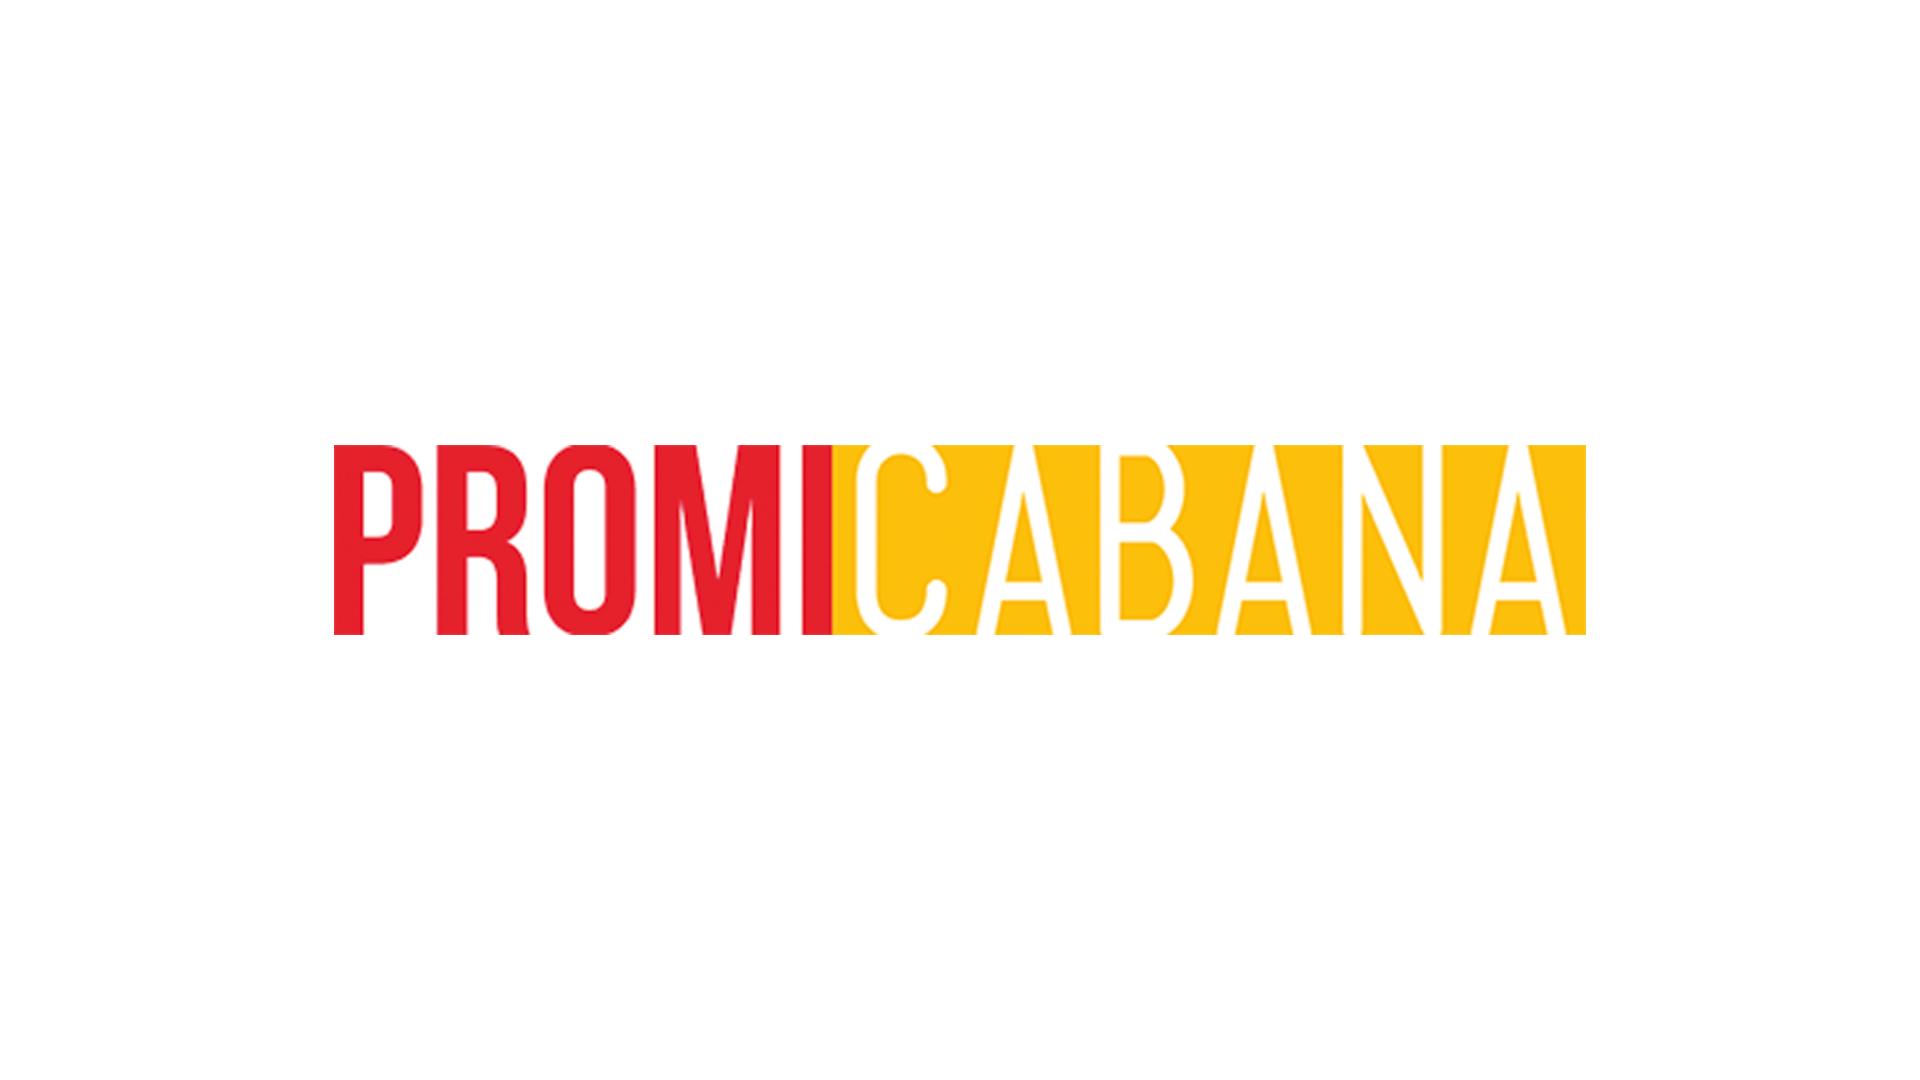 Benedict-Cumberbatch-Keira-Knightley-The-Imitation-Game-Trailer